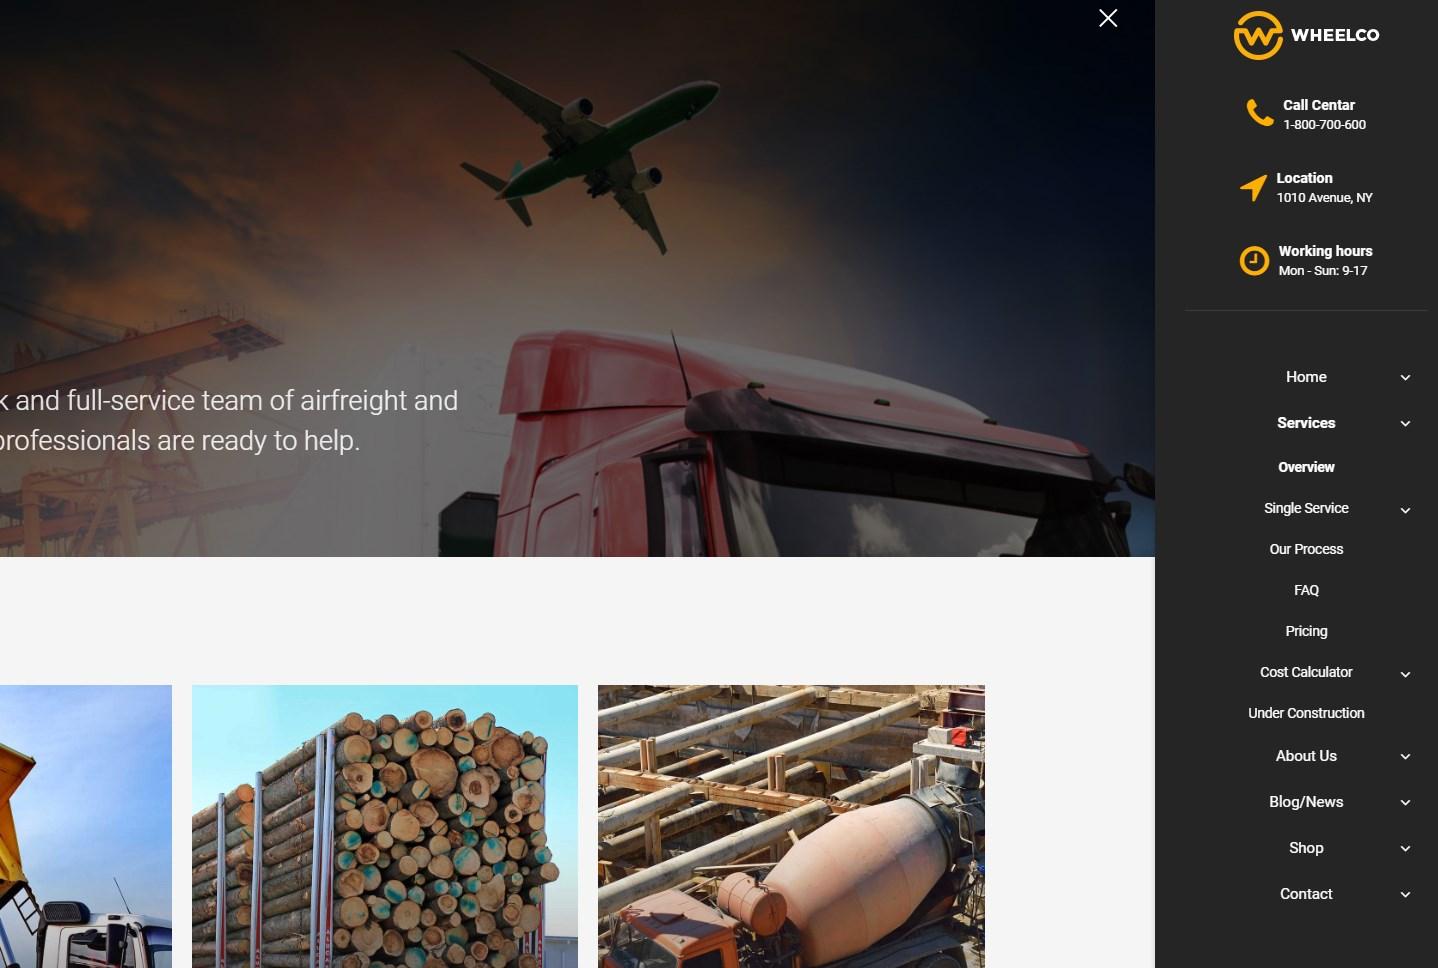 https://documentation.bold-themes.com/wheelco/wp-content/uploads/sites/23/2016/07/wheelco-screenshot-17.jpg